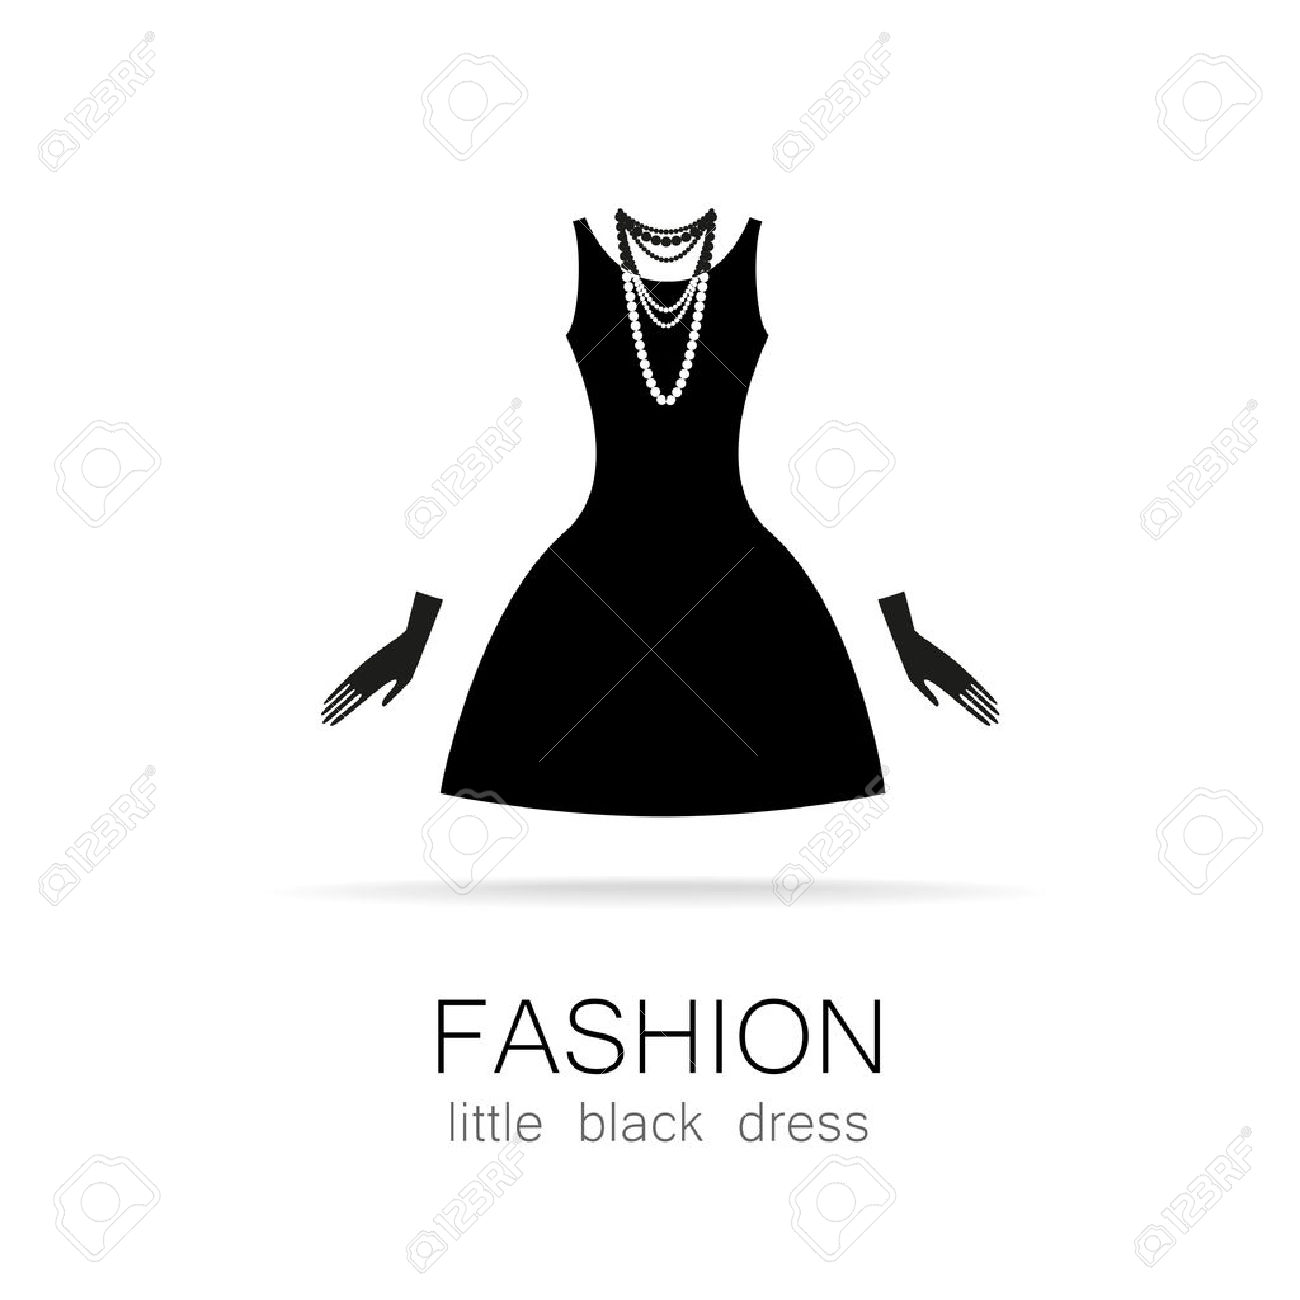 Dress clipart little black dress  Little clipart Dresses black